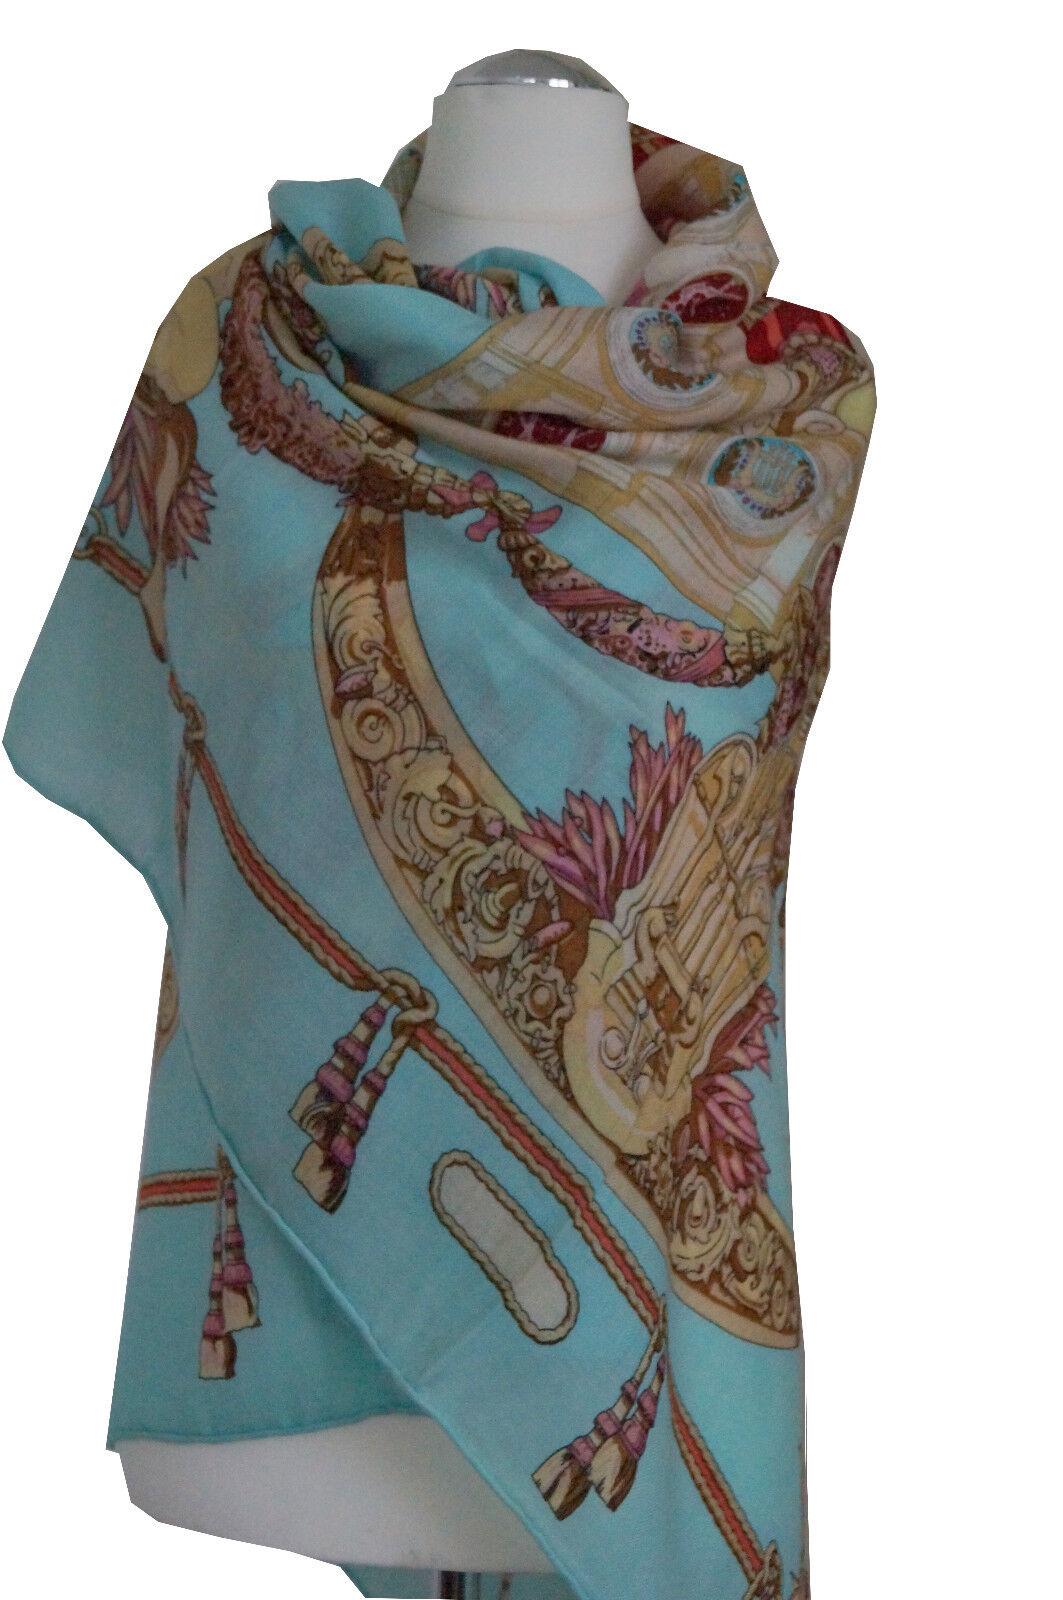 Wunderschönes Damentuch aus Seide-Kaschmir-Wolle, 130x130cm, Handrolliert.